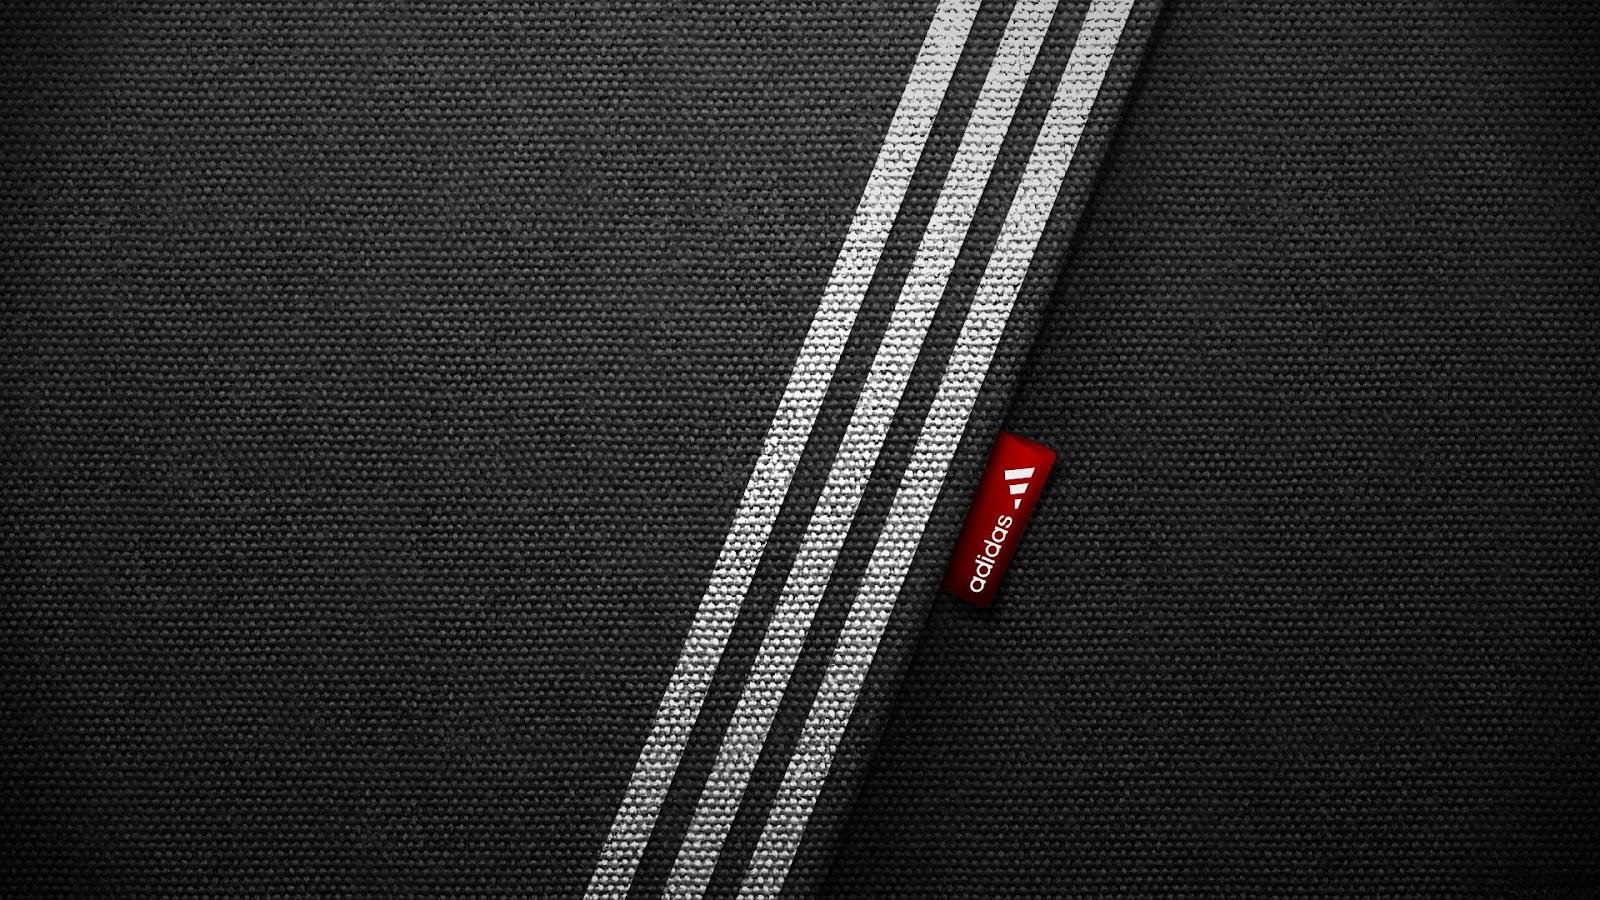 Adidas wallpaper 8919 1600x900 px hdwallsource adidas wallpaper 8919 voltagebd Image collections